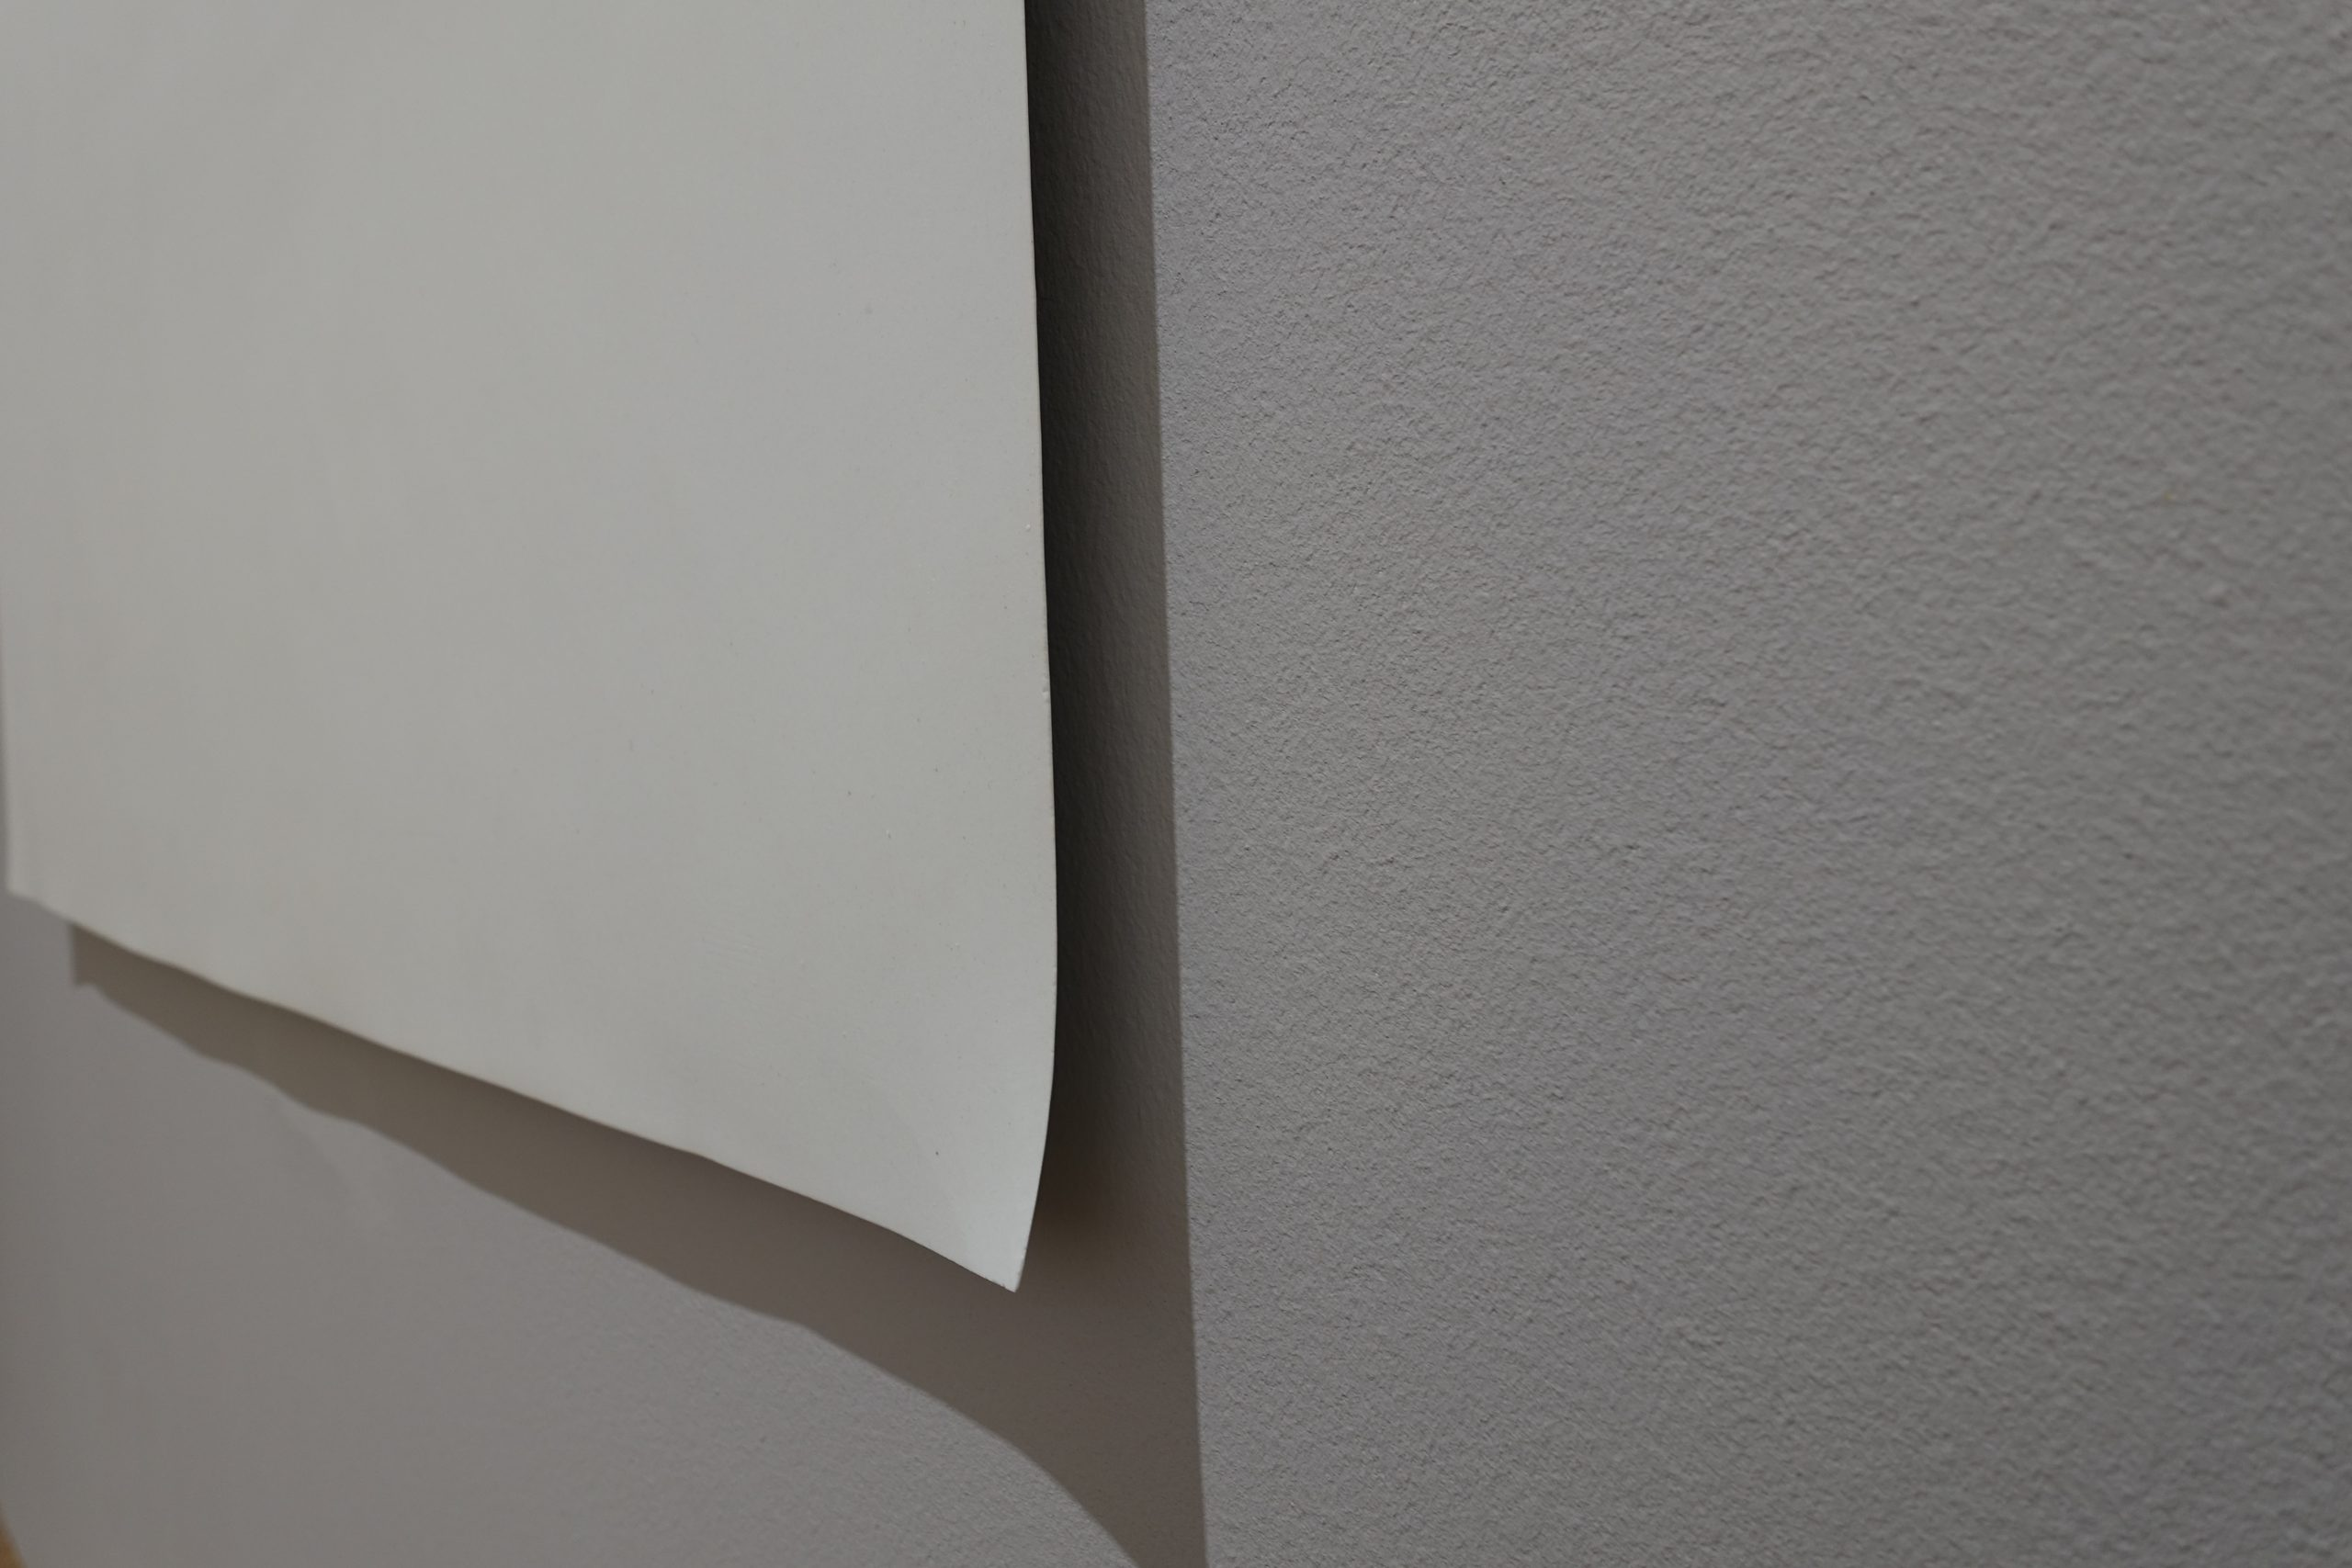 Liu Jianhua, Blank Paper, 2009-12.